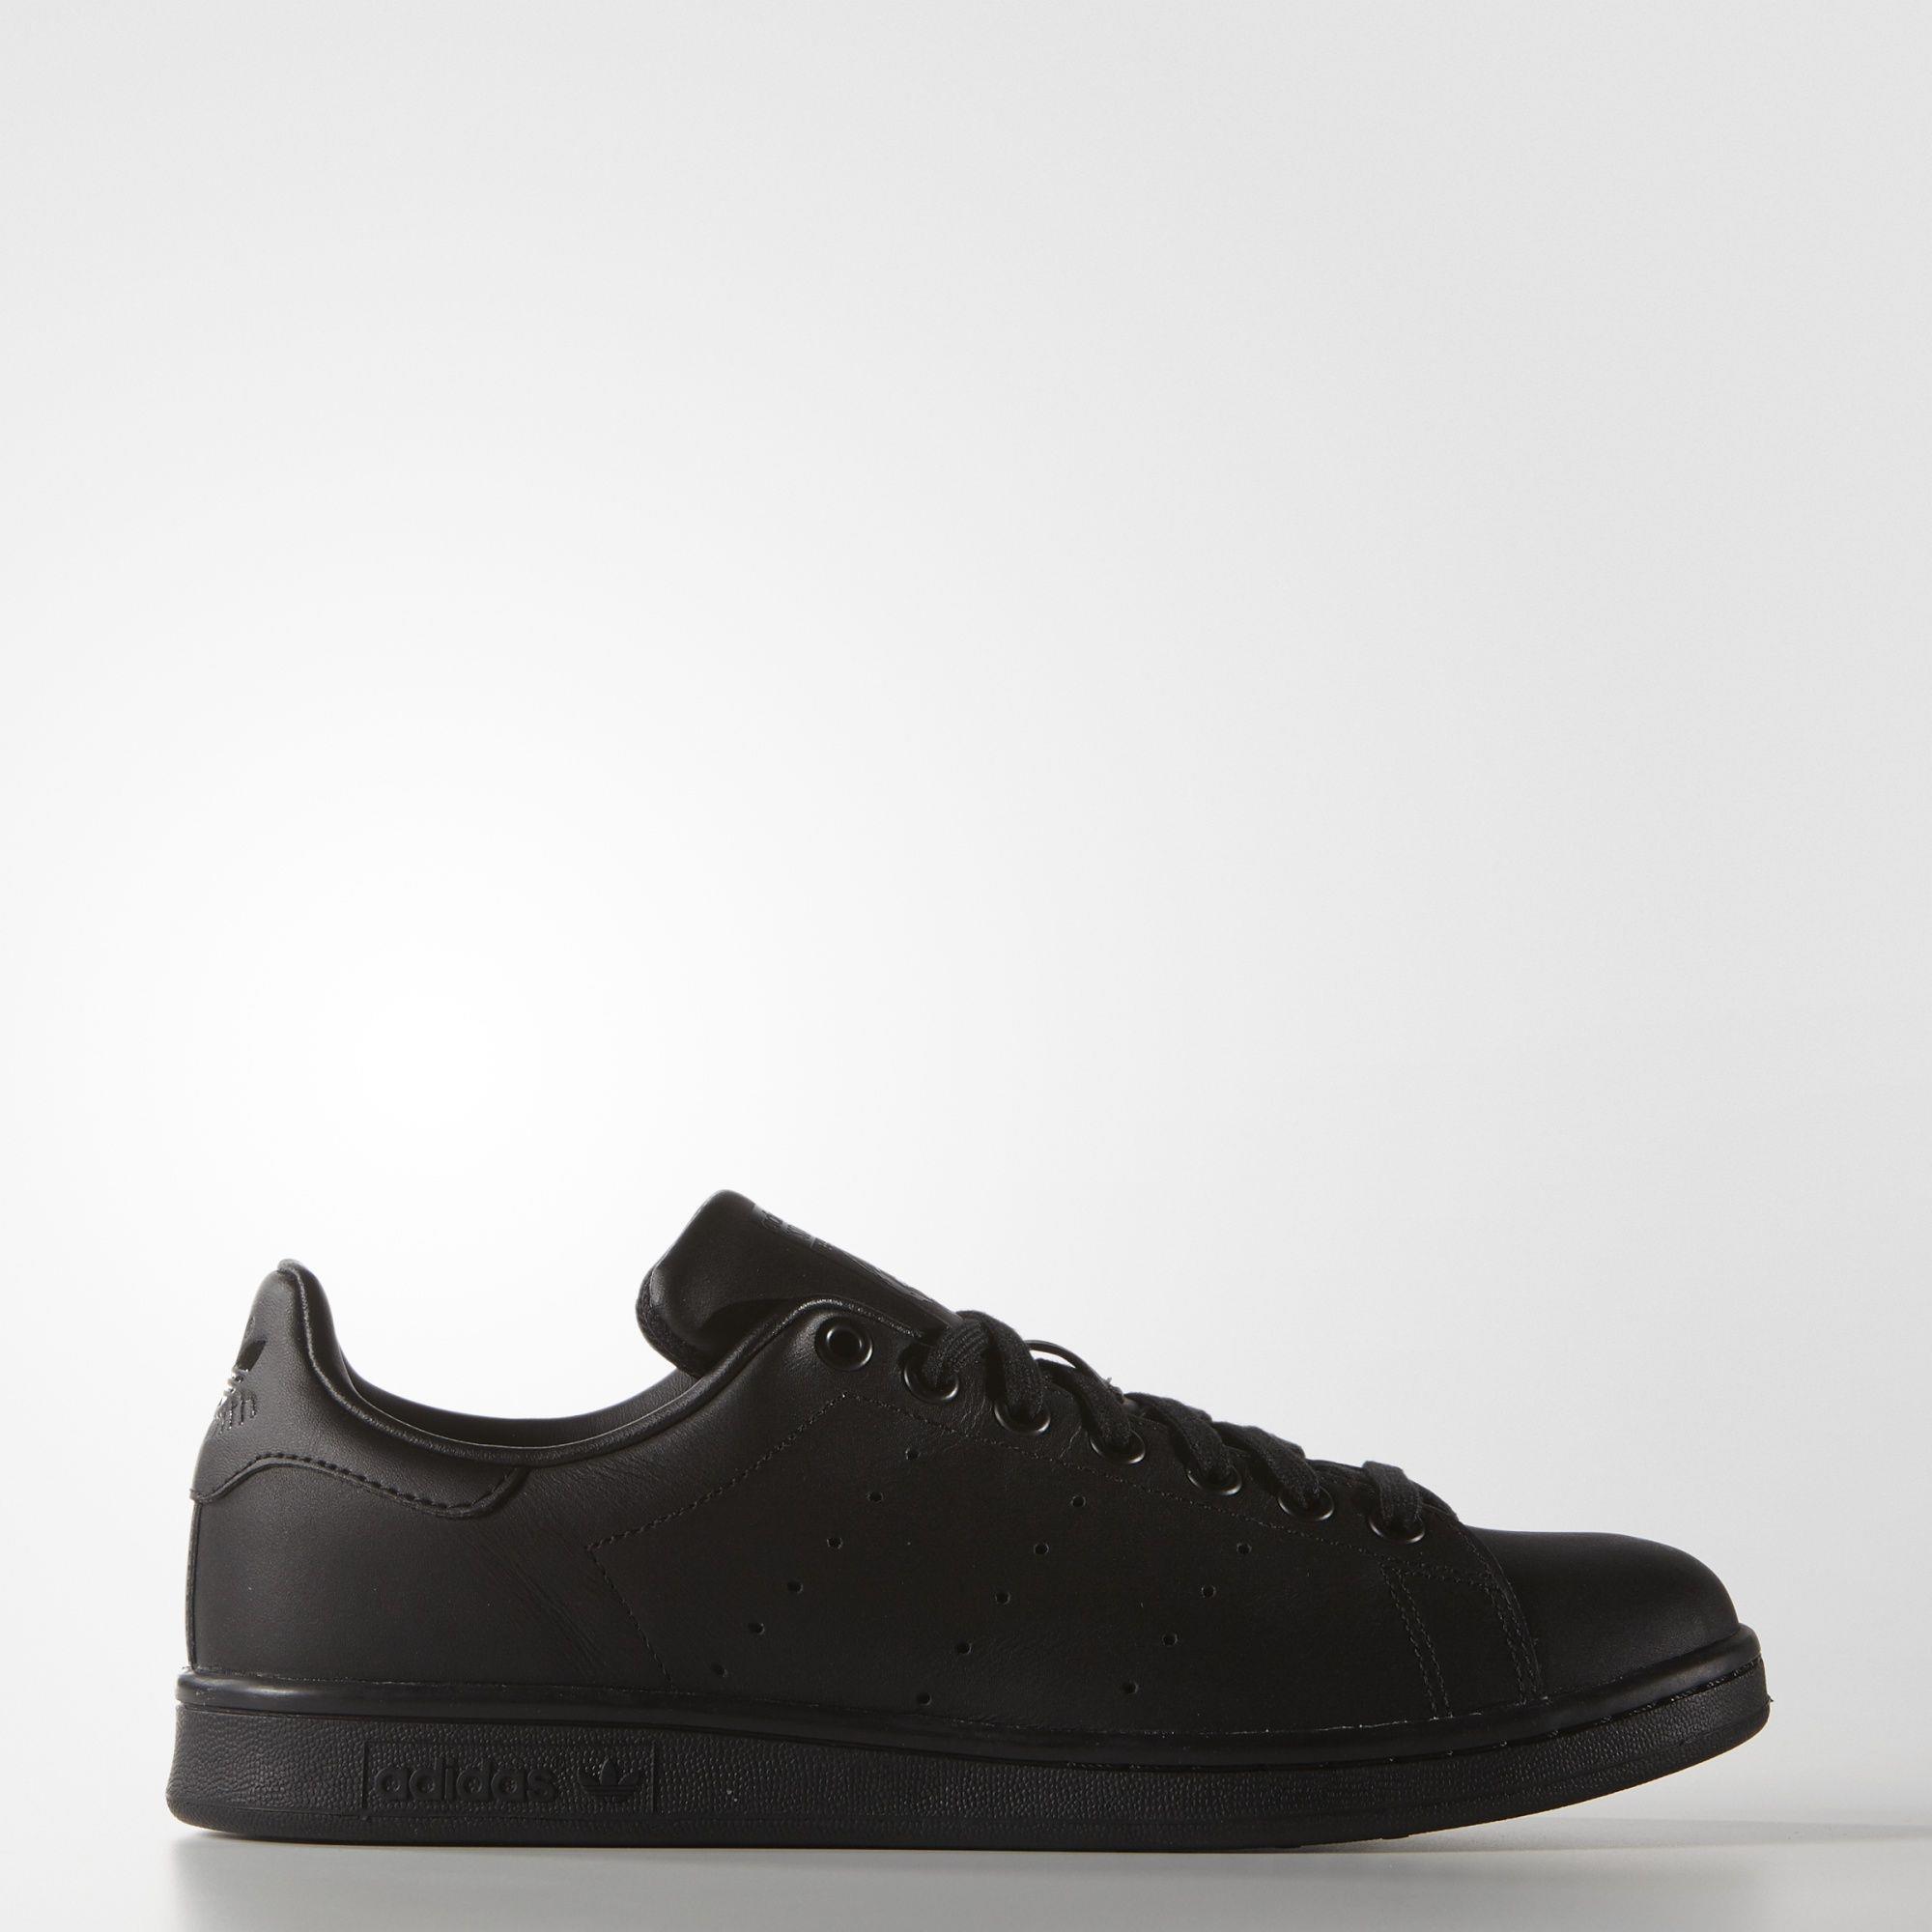 adidas rize nere